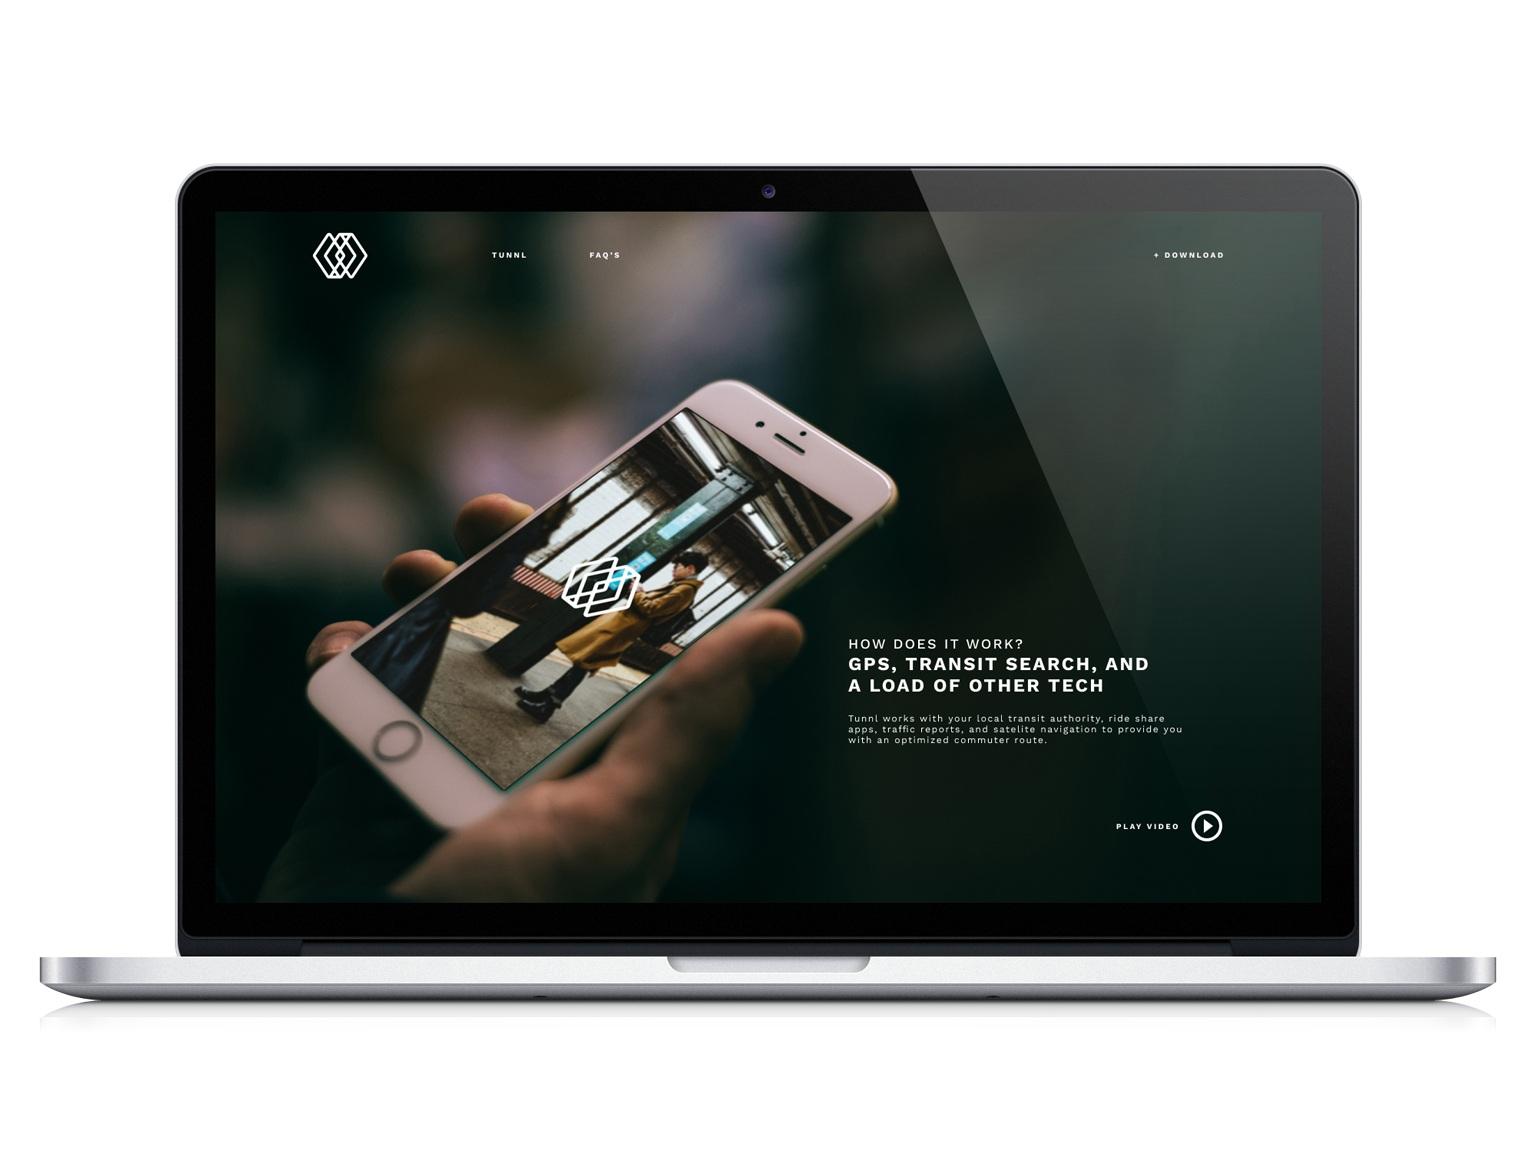 MacBook-Pro-mockup-5.jpg